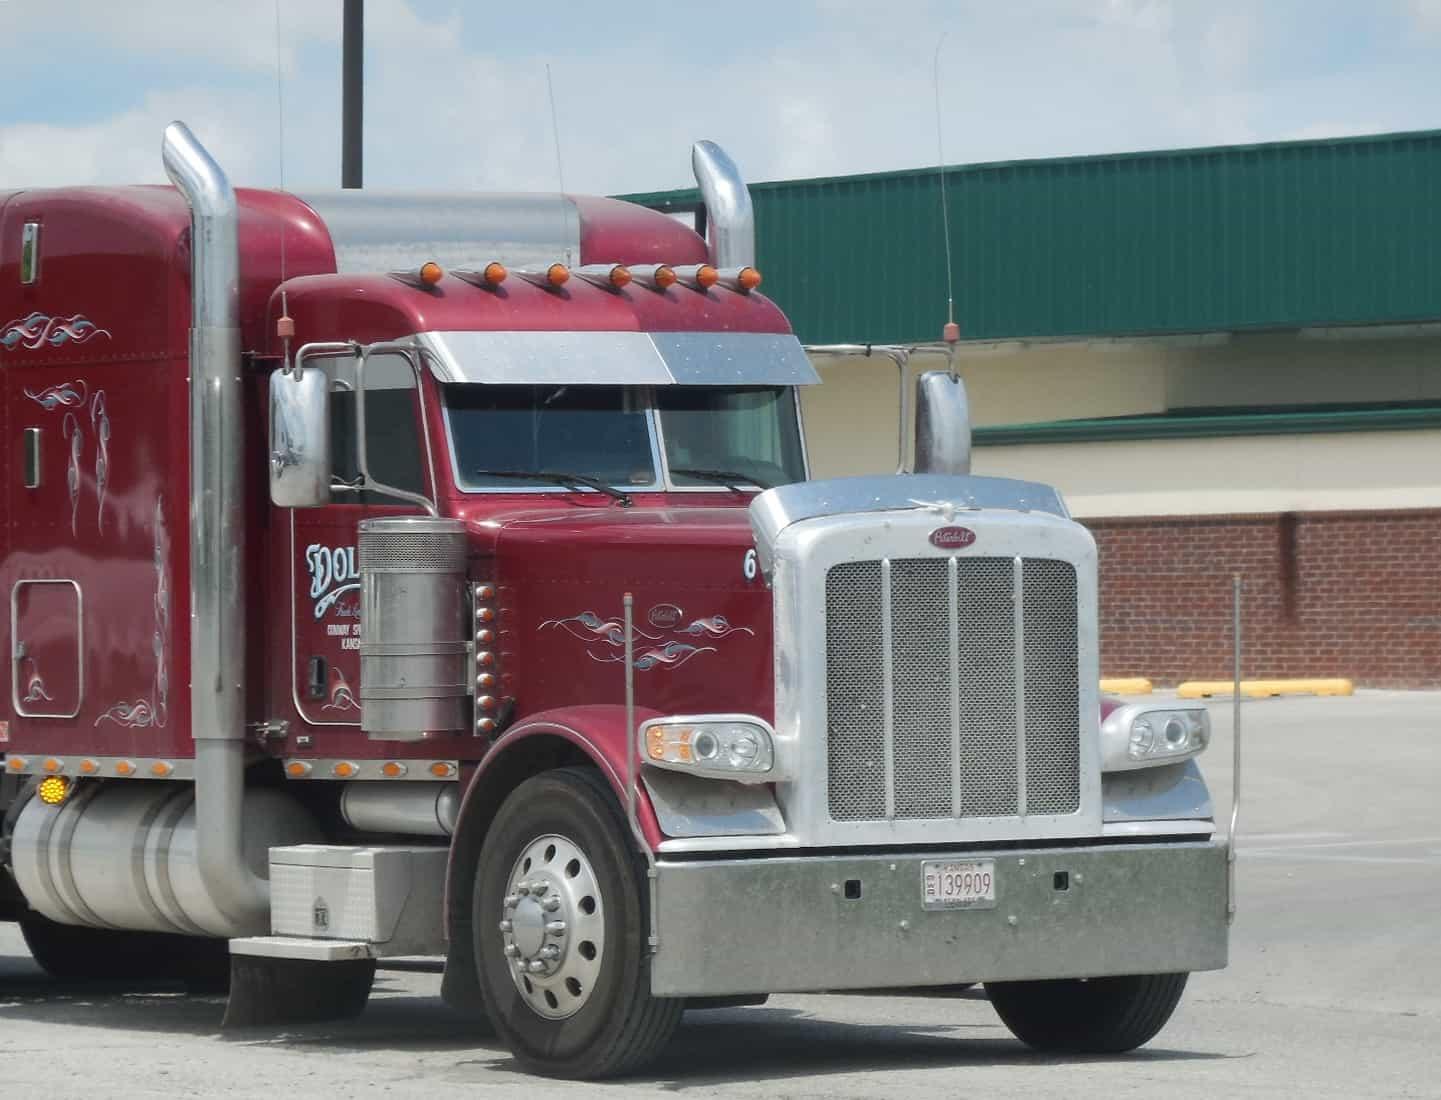 Washington Apricot Shipments are Starting 3rd Week of June